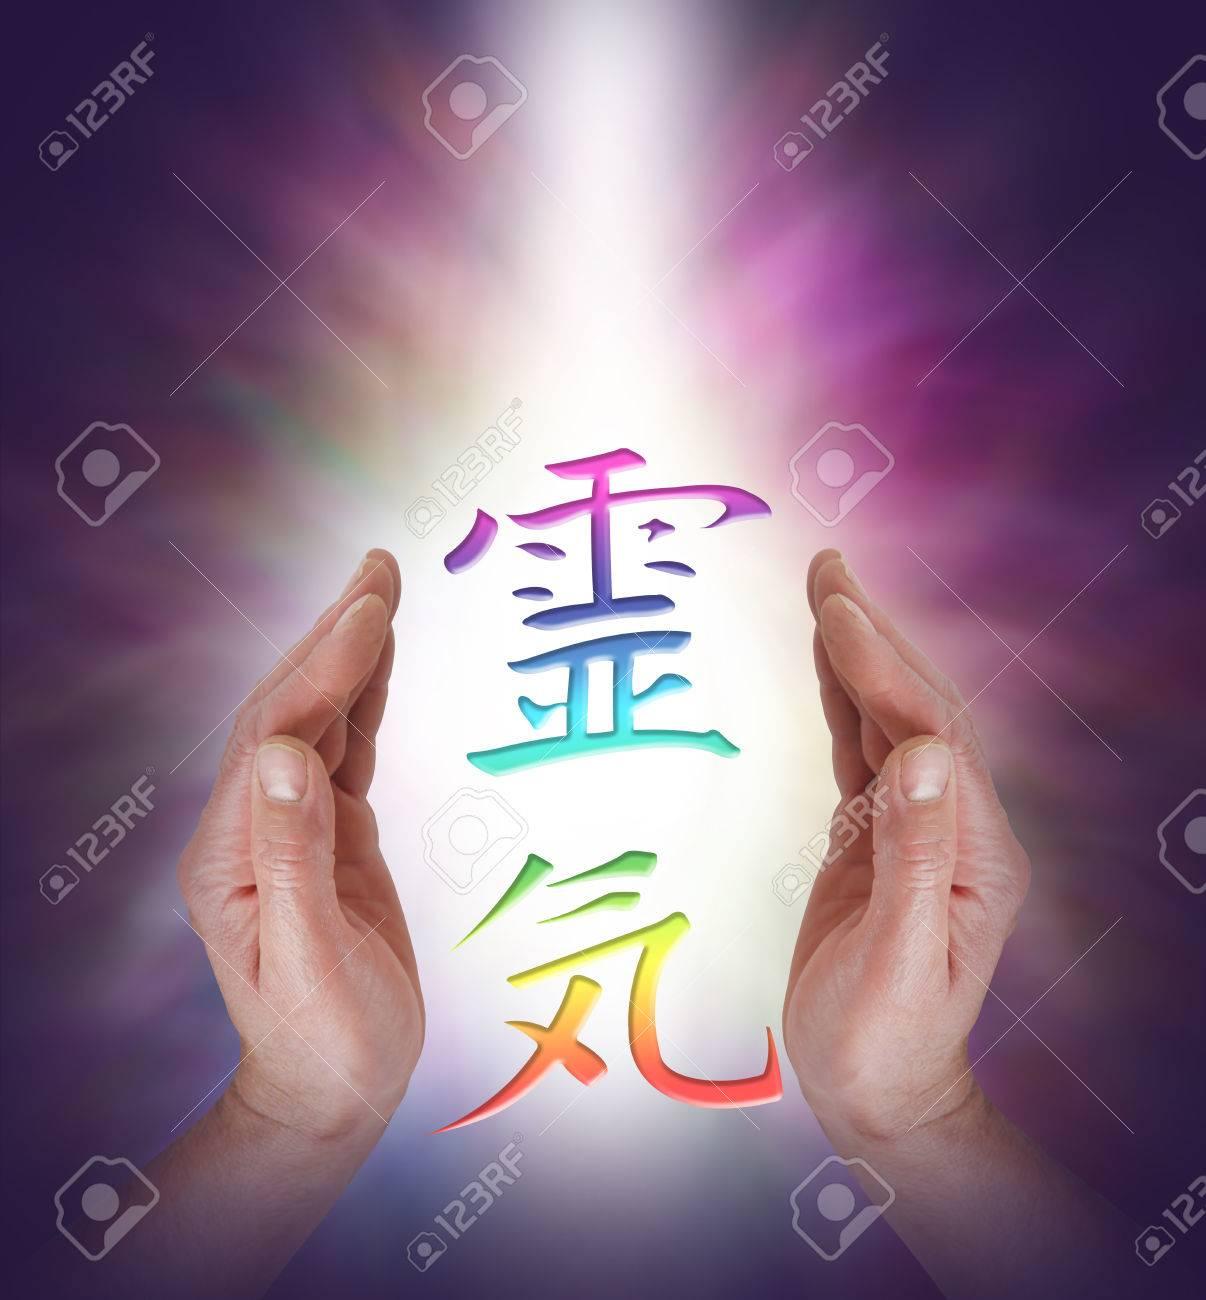 Embracing the art of reiki energy healing reiki kanji symbol embracing the art of reiki energy healing reiki kanji symbol floating between male healers hands buycottarizona Choice Image